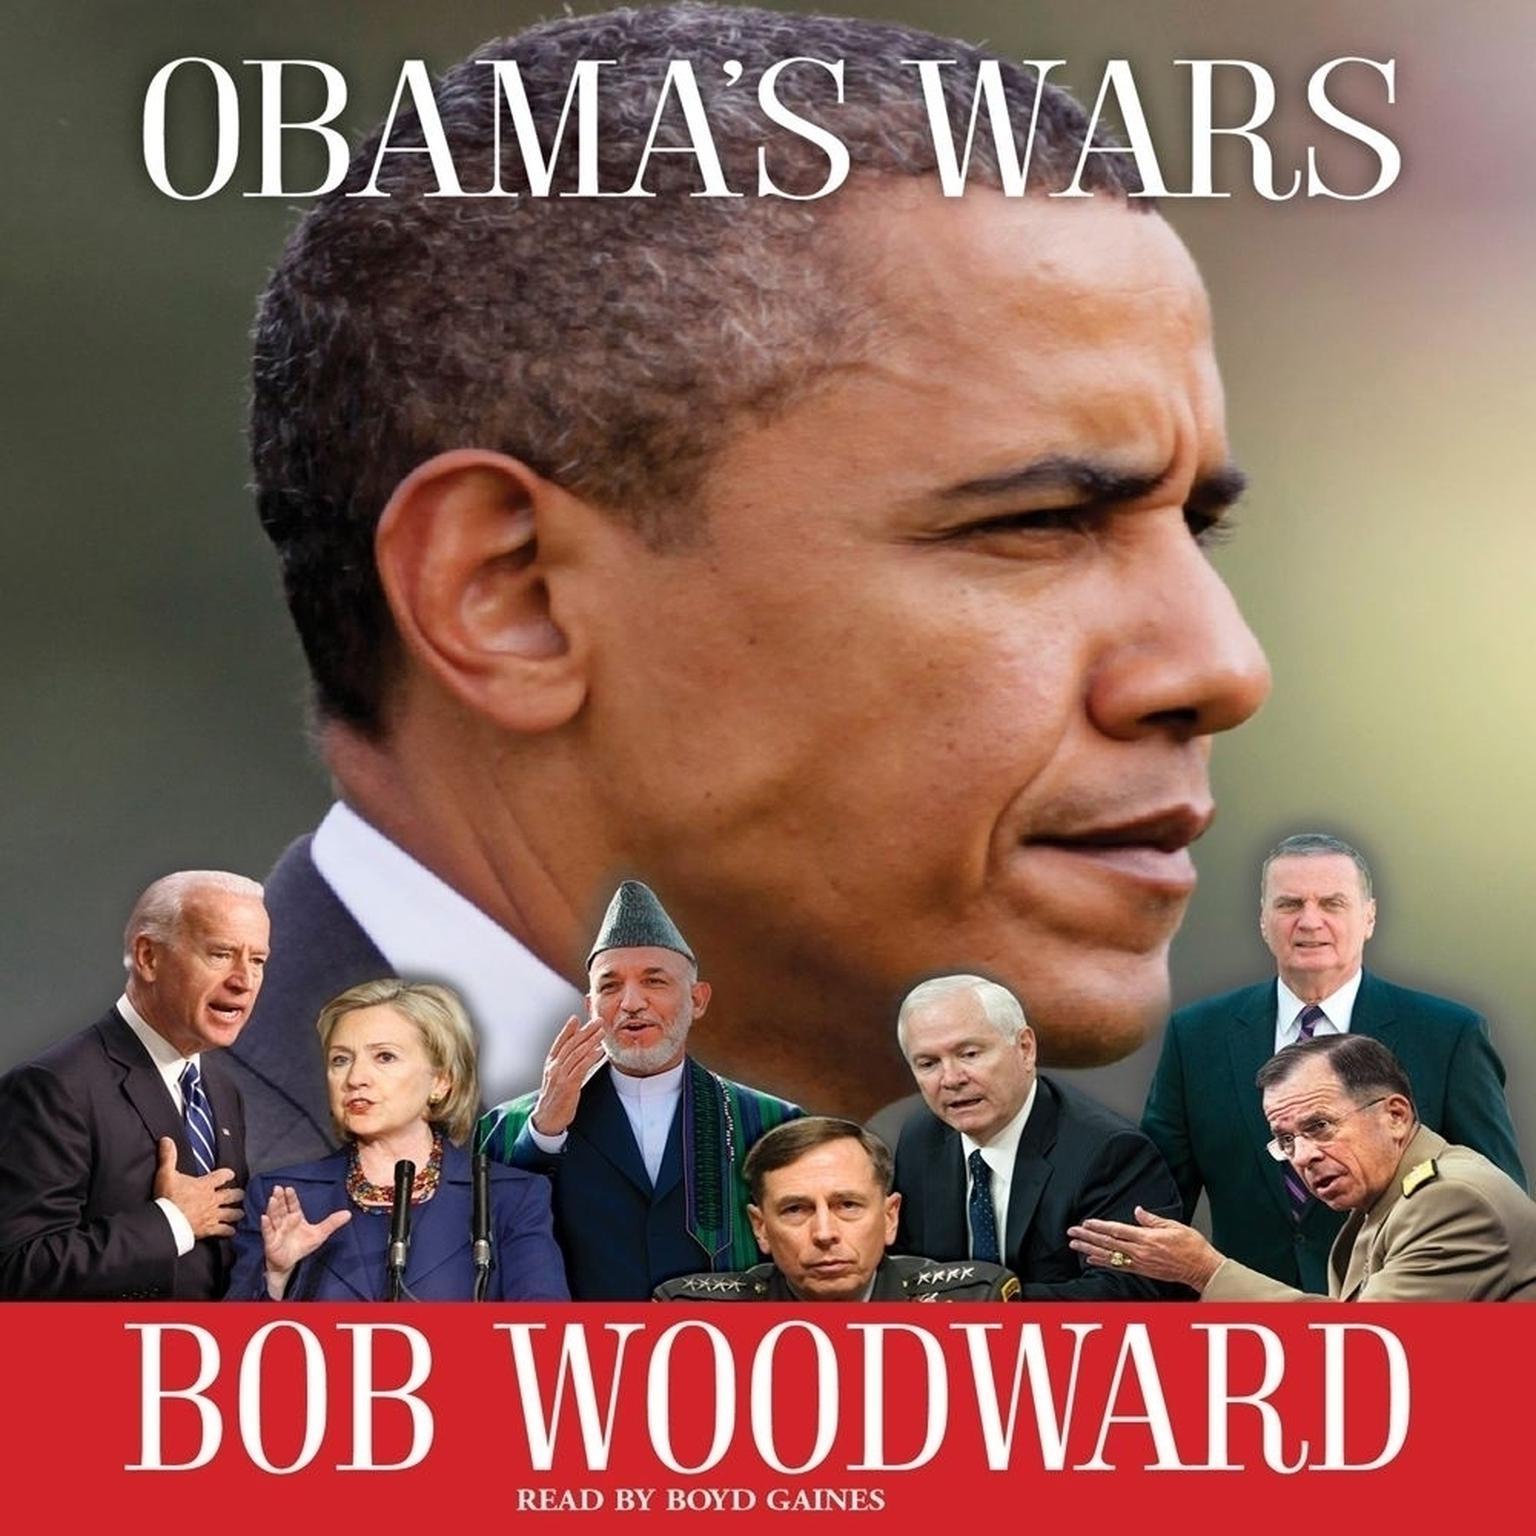 Obamas Wars (Abridged) Audiobook, by Bob Woodward